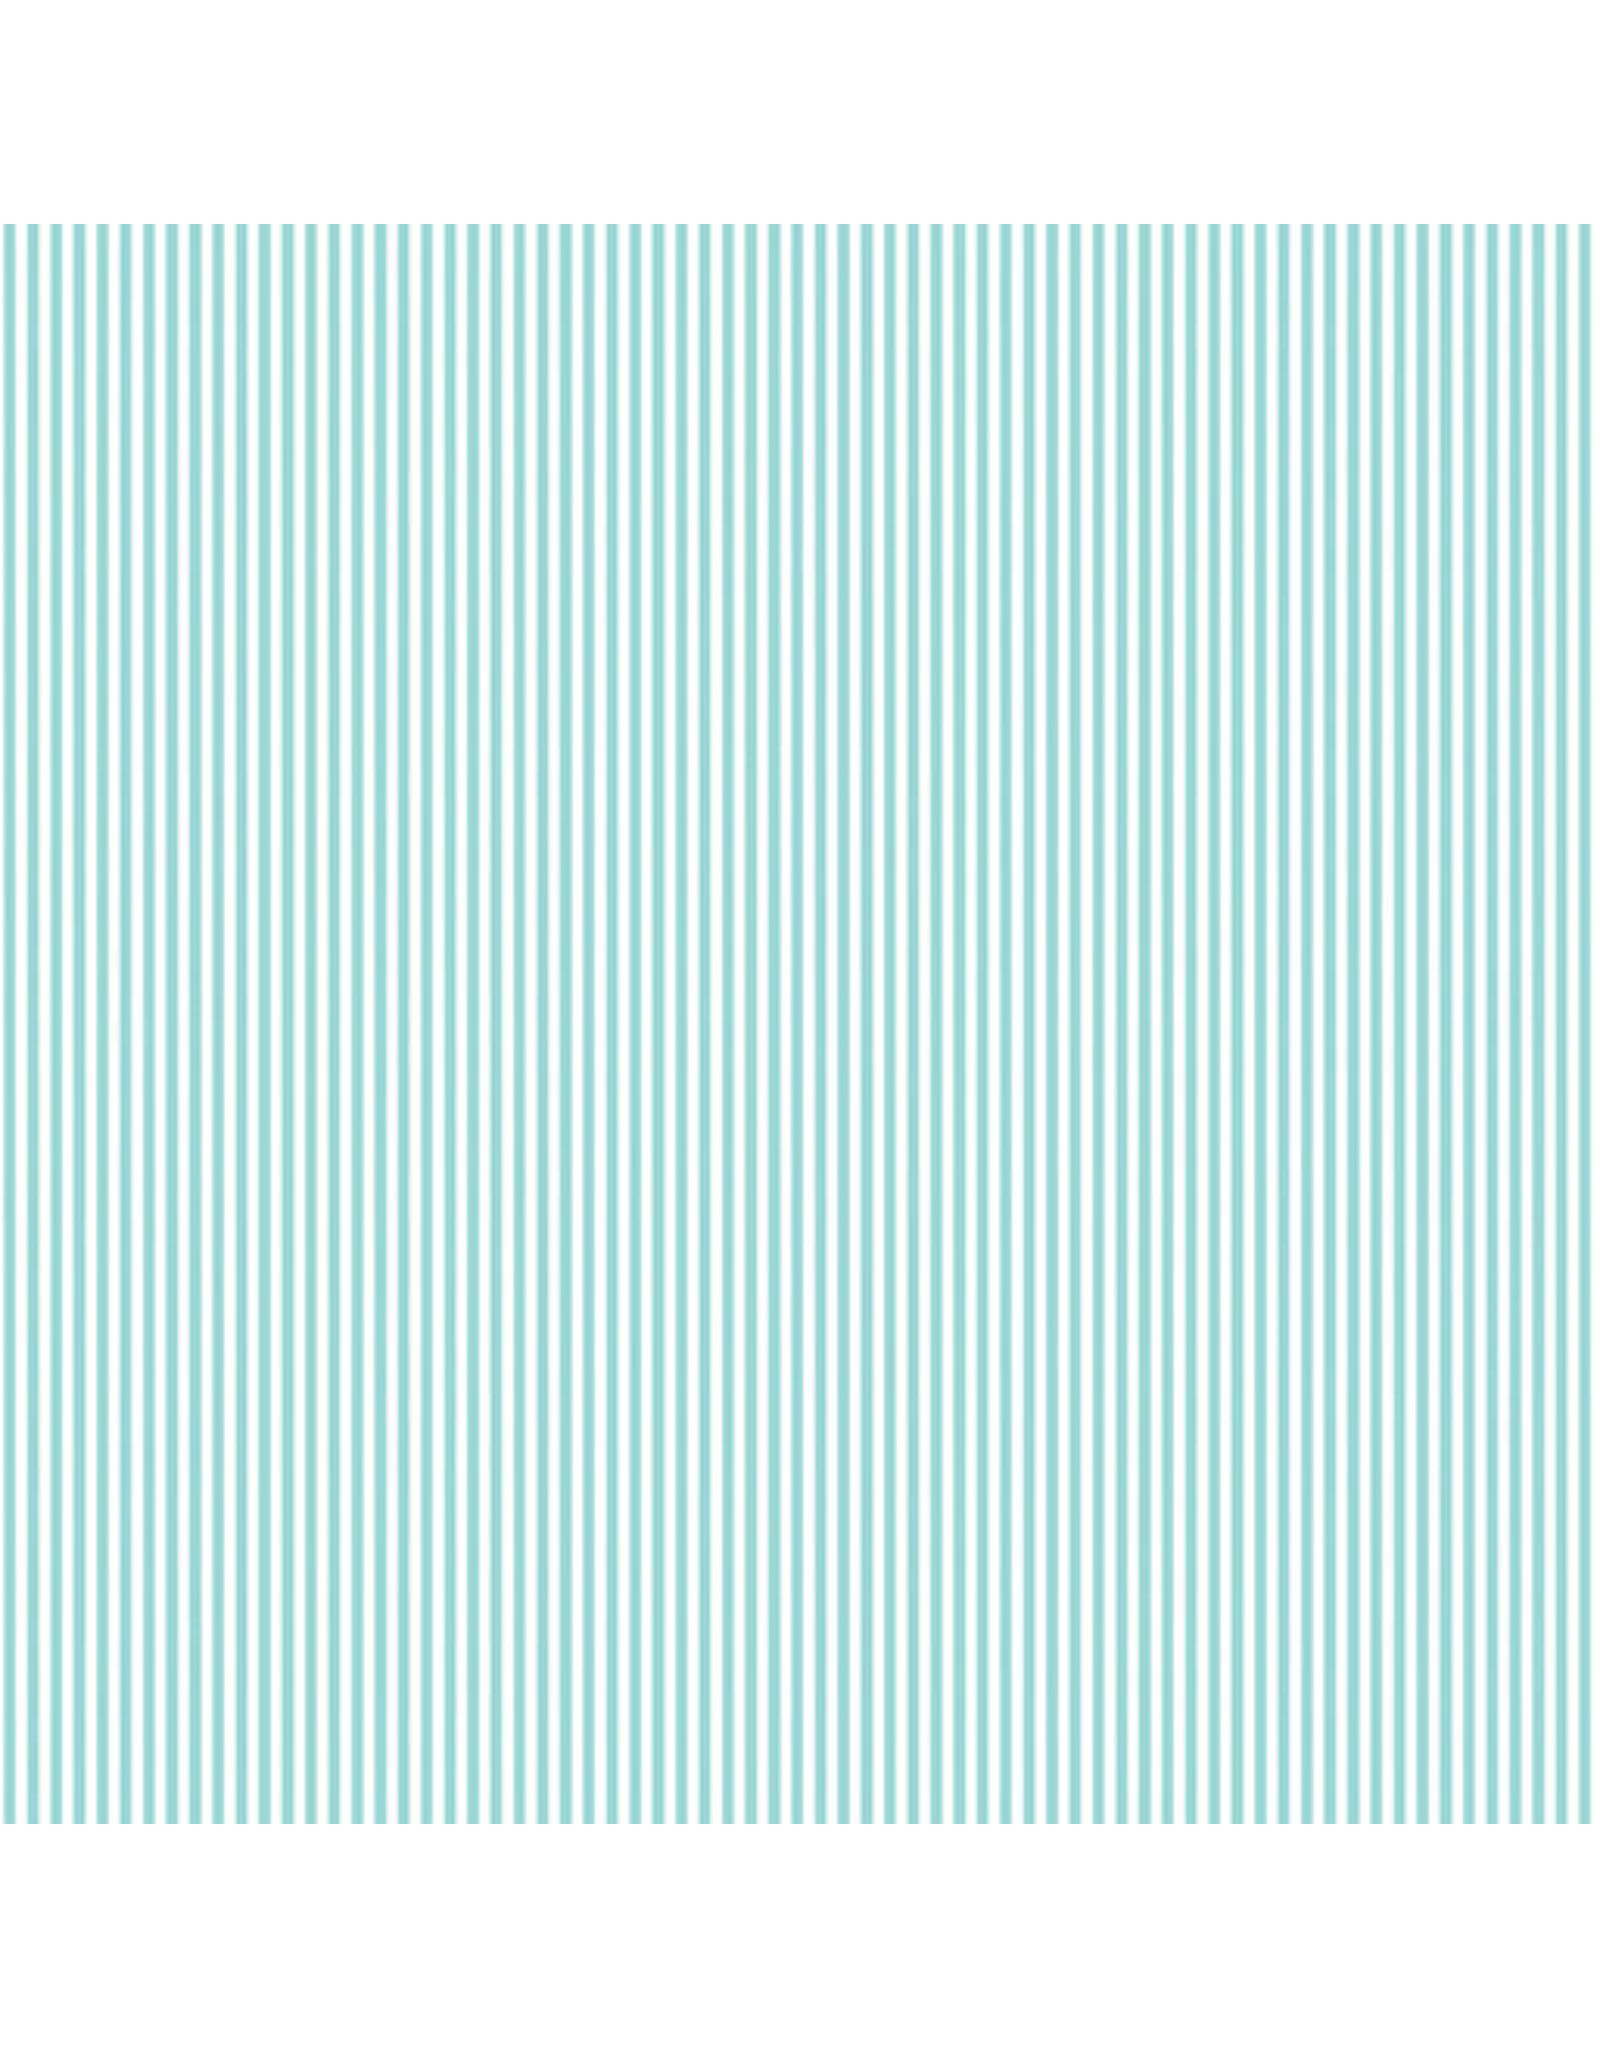 Contempo My Little Sunshine 2 - Pinstripe Turquoise